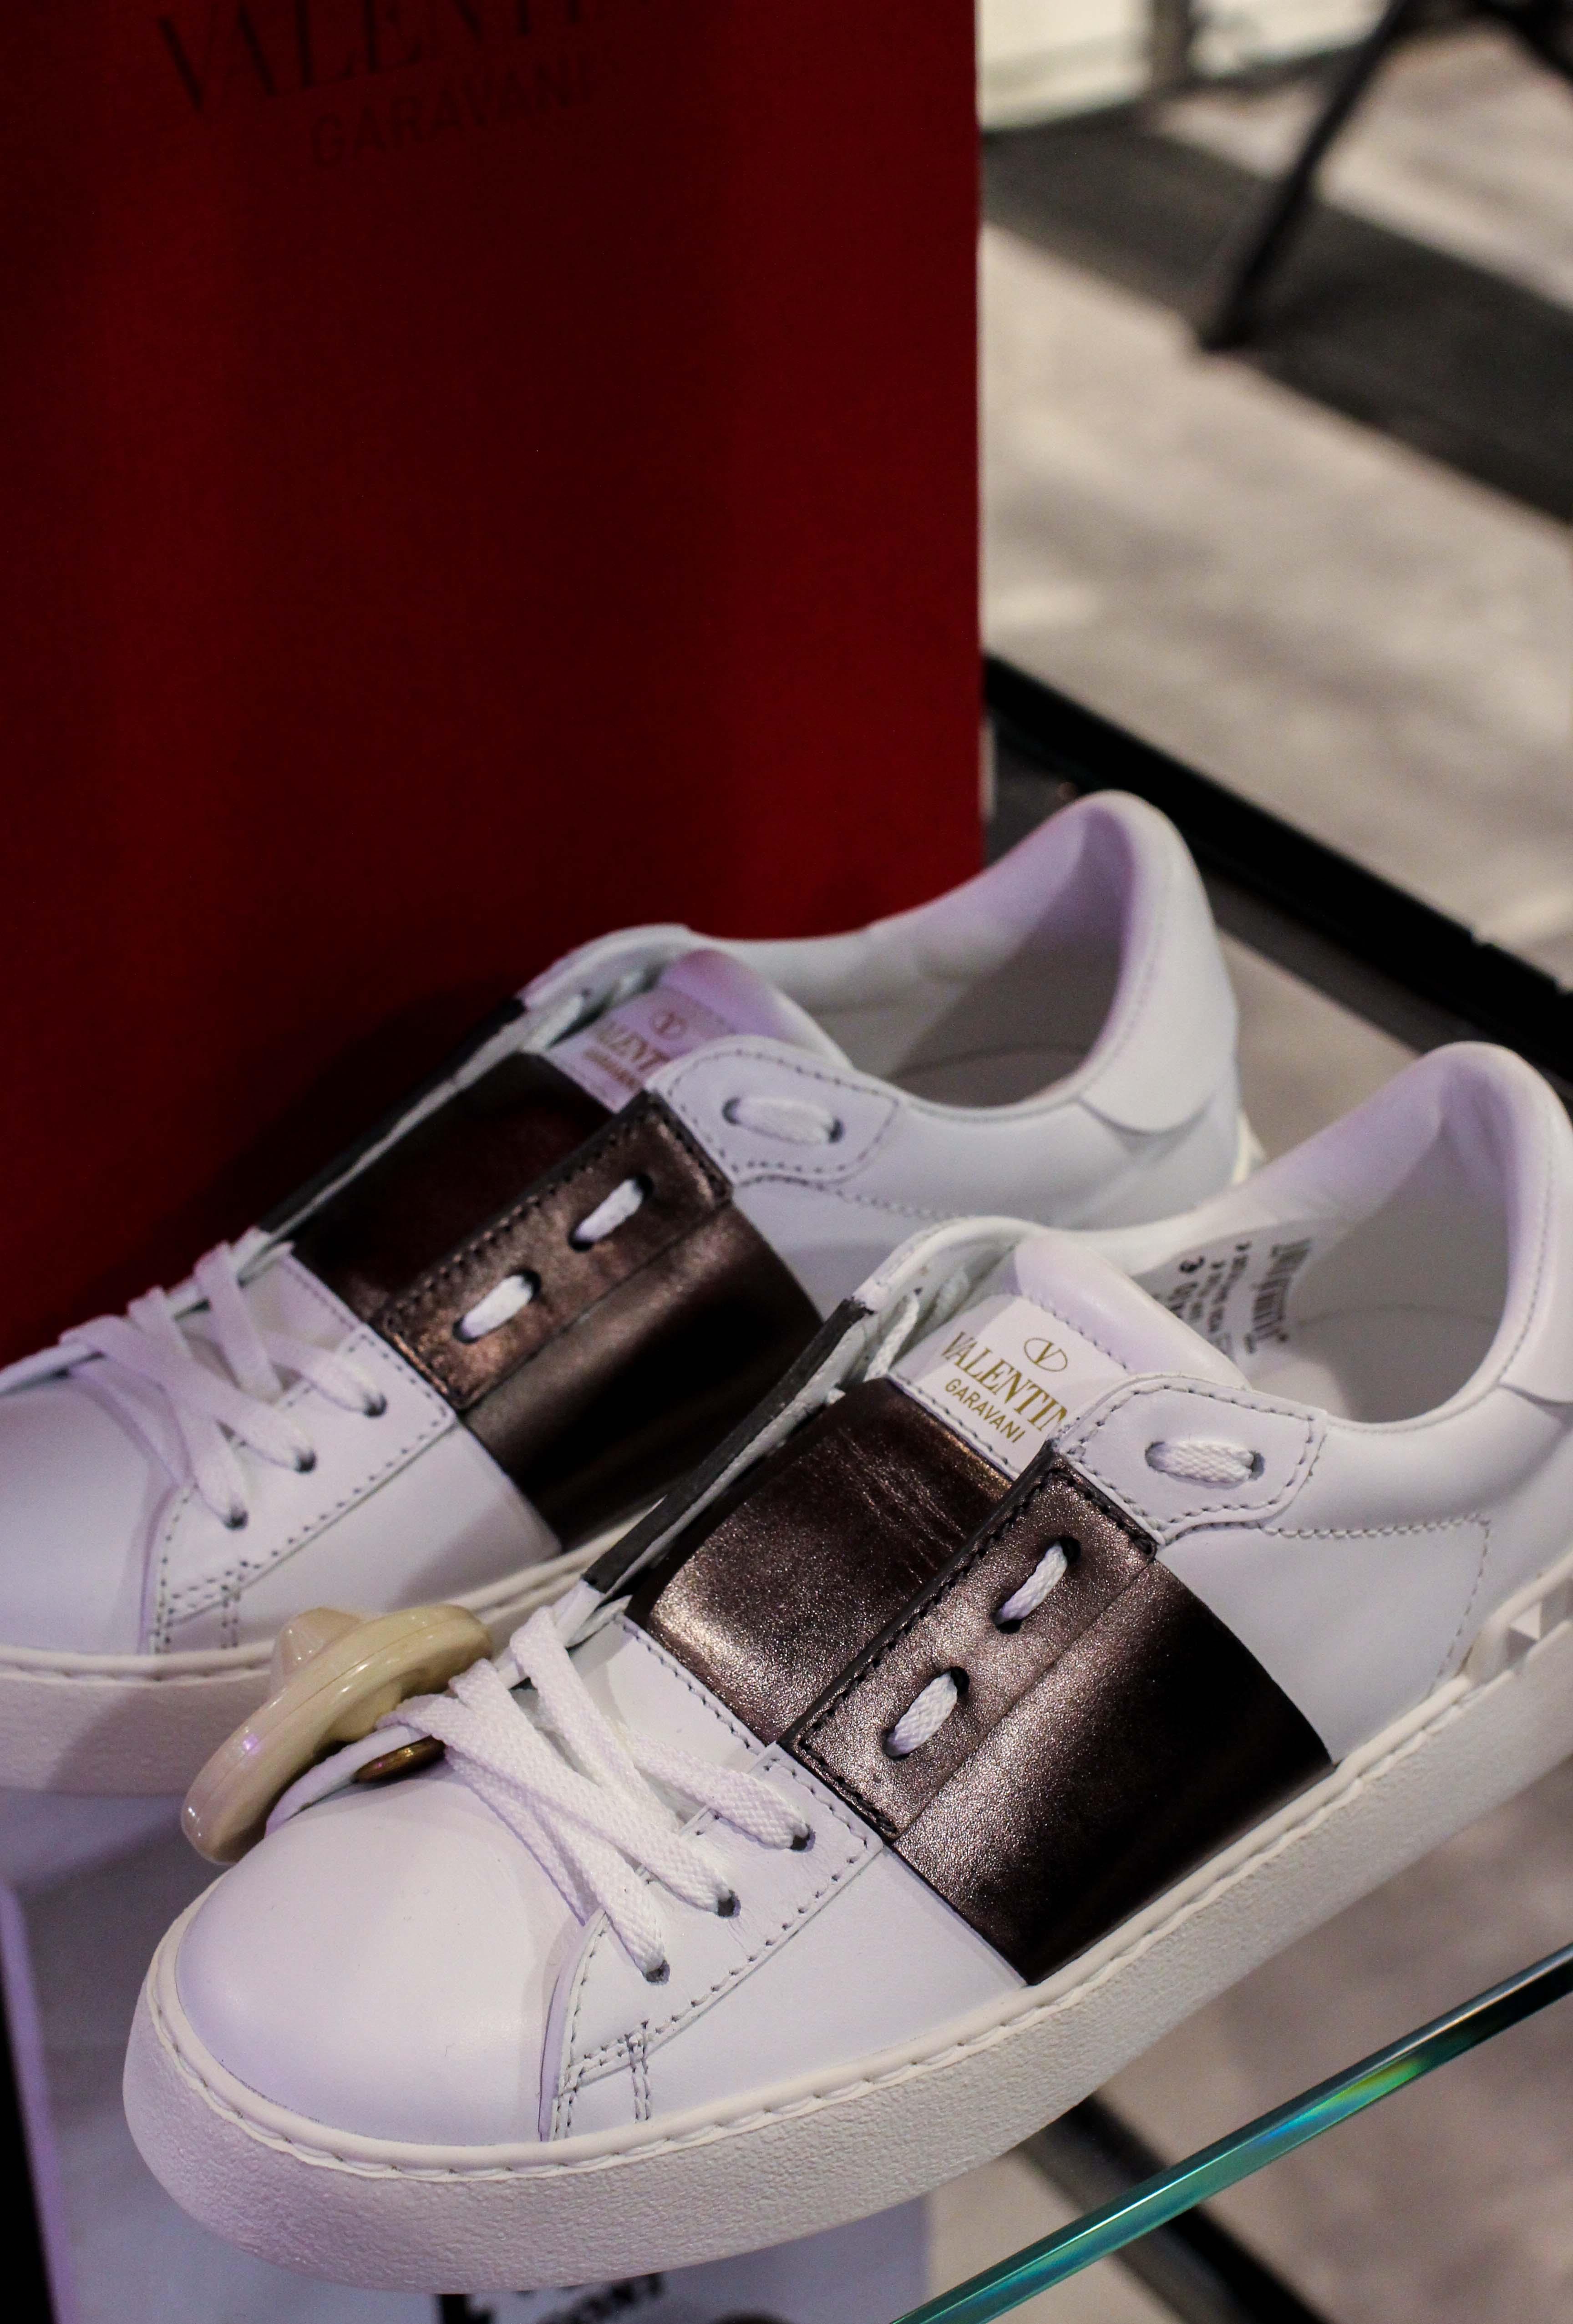 Valentino Sneaker weiß Store Opening Saks OFF 5th Avenue Bonn Premium-Marken Outletpreis Designer Outlet Bonn Modeblog